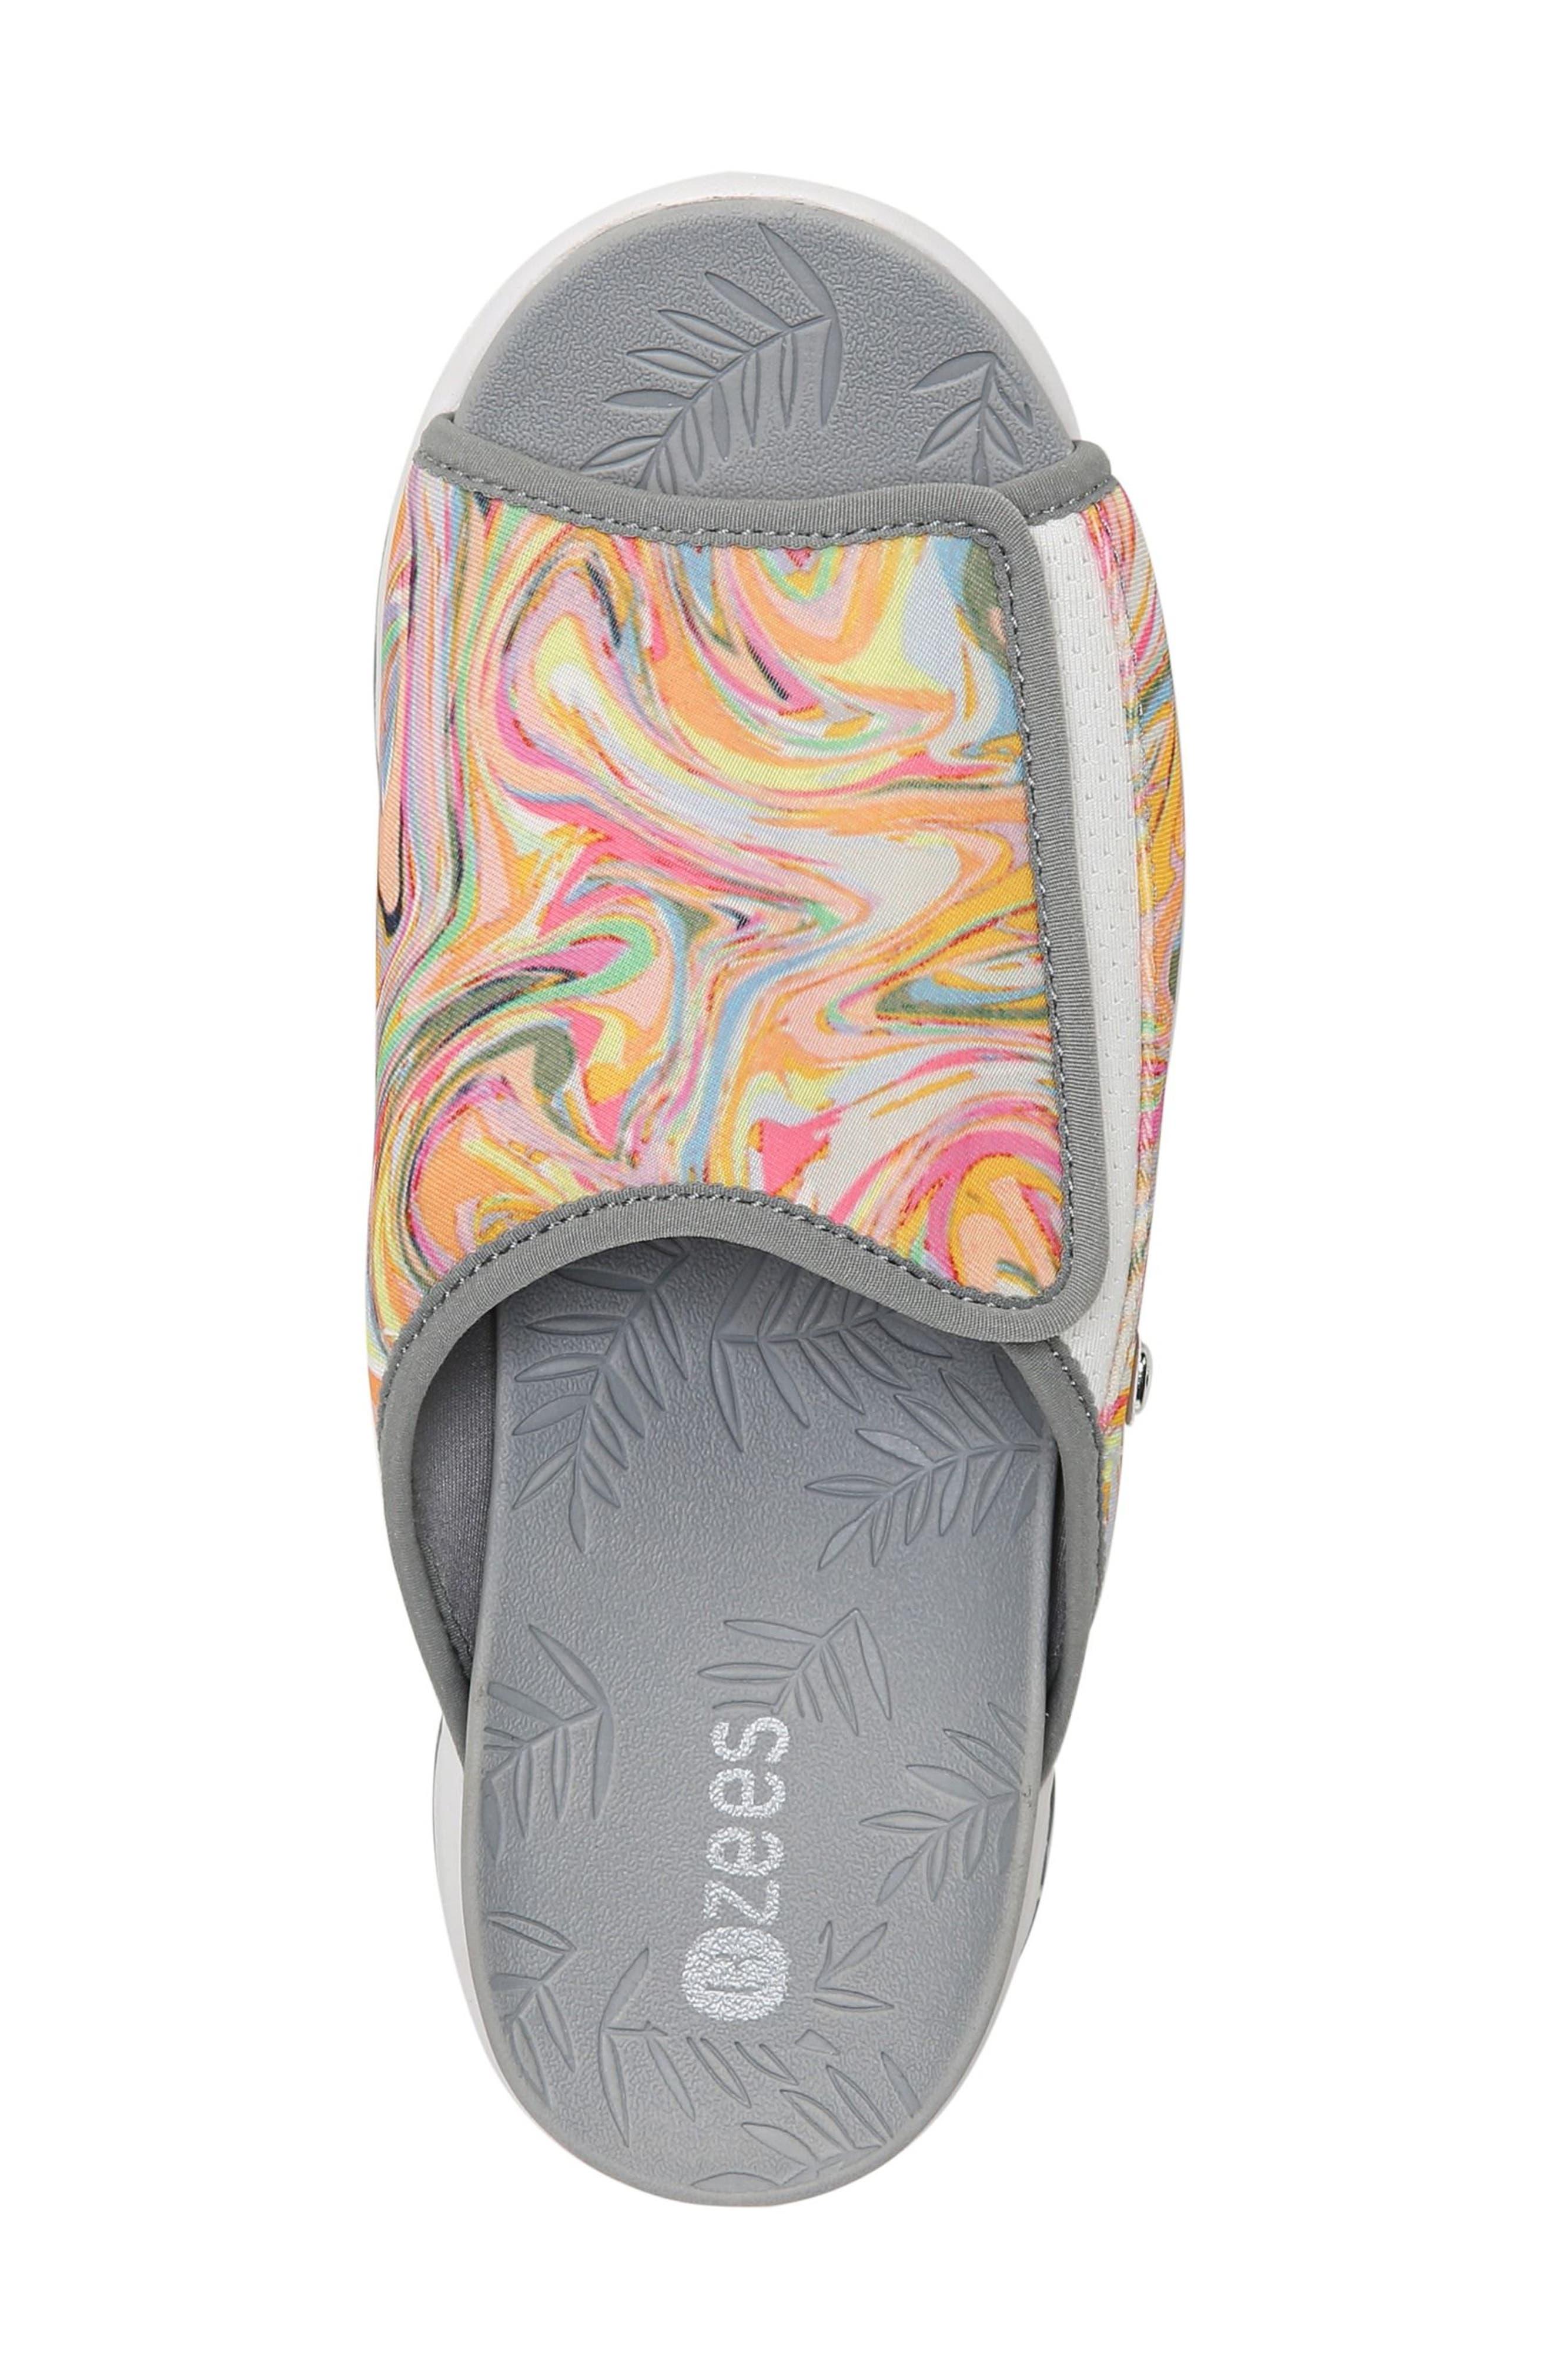 Galaxy Slide Sandal,                             Alternate thumbnail 5, color,                             Lava Fabric